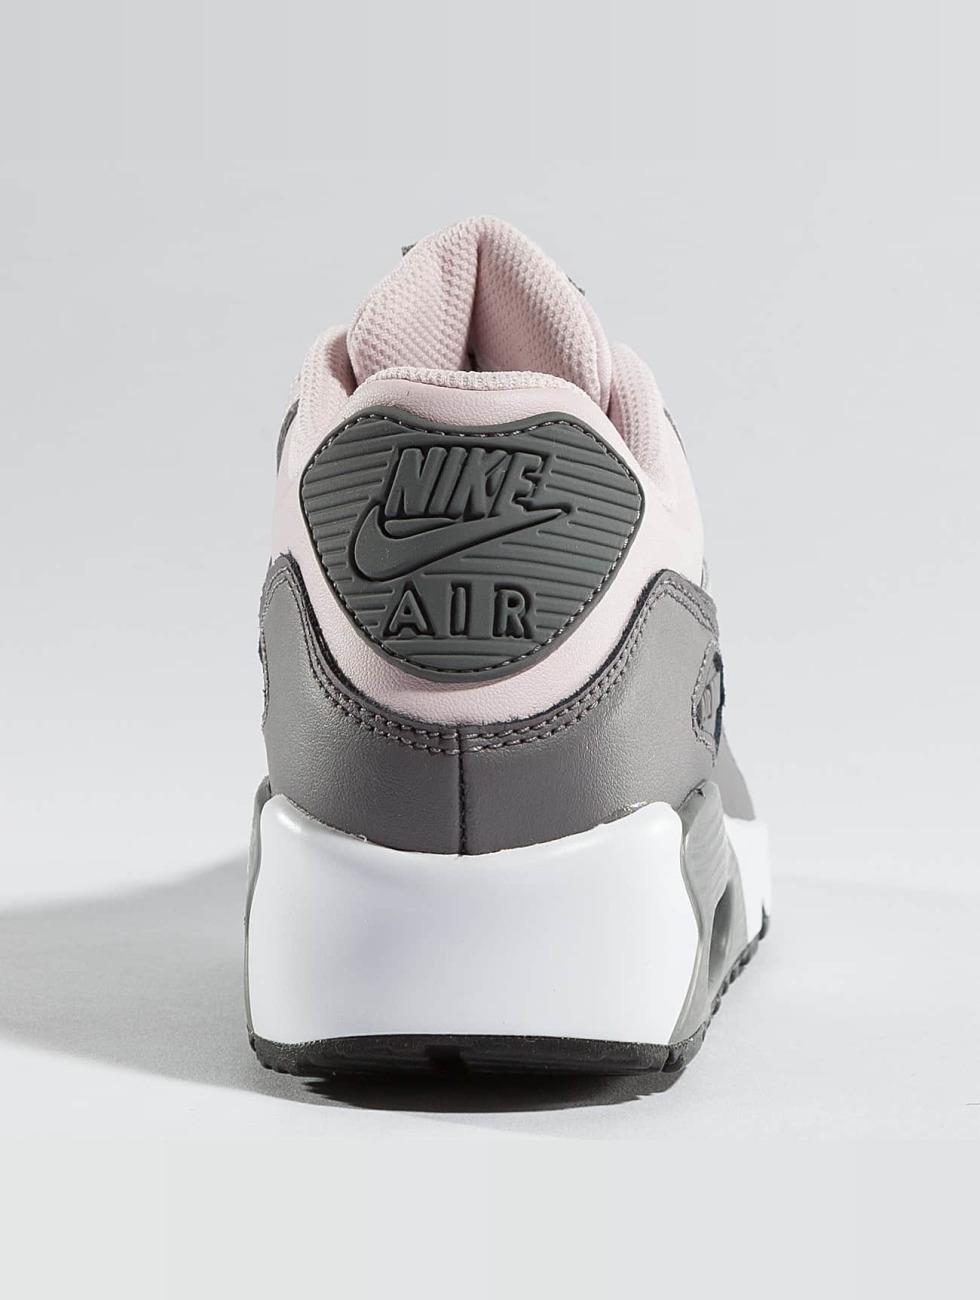 Chaussures De Sport Laag Panier Coeur Brevet Rosa Pumas sFPYAFKmx